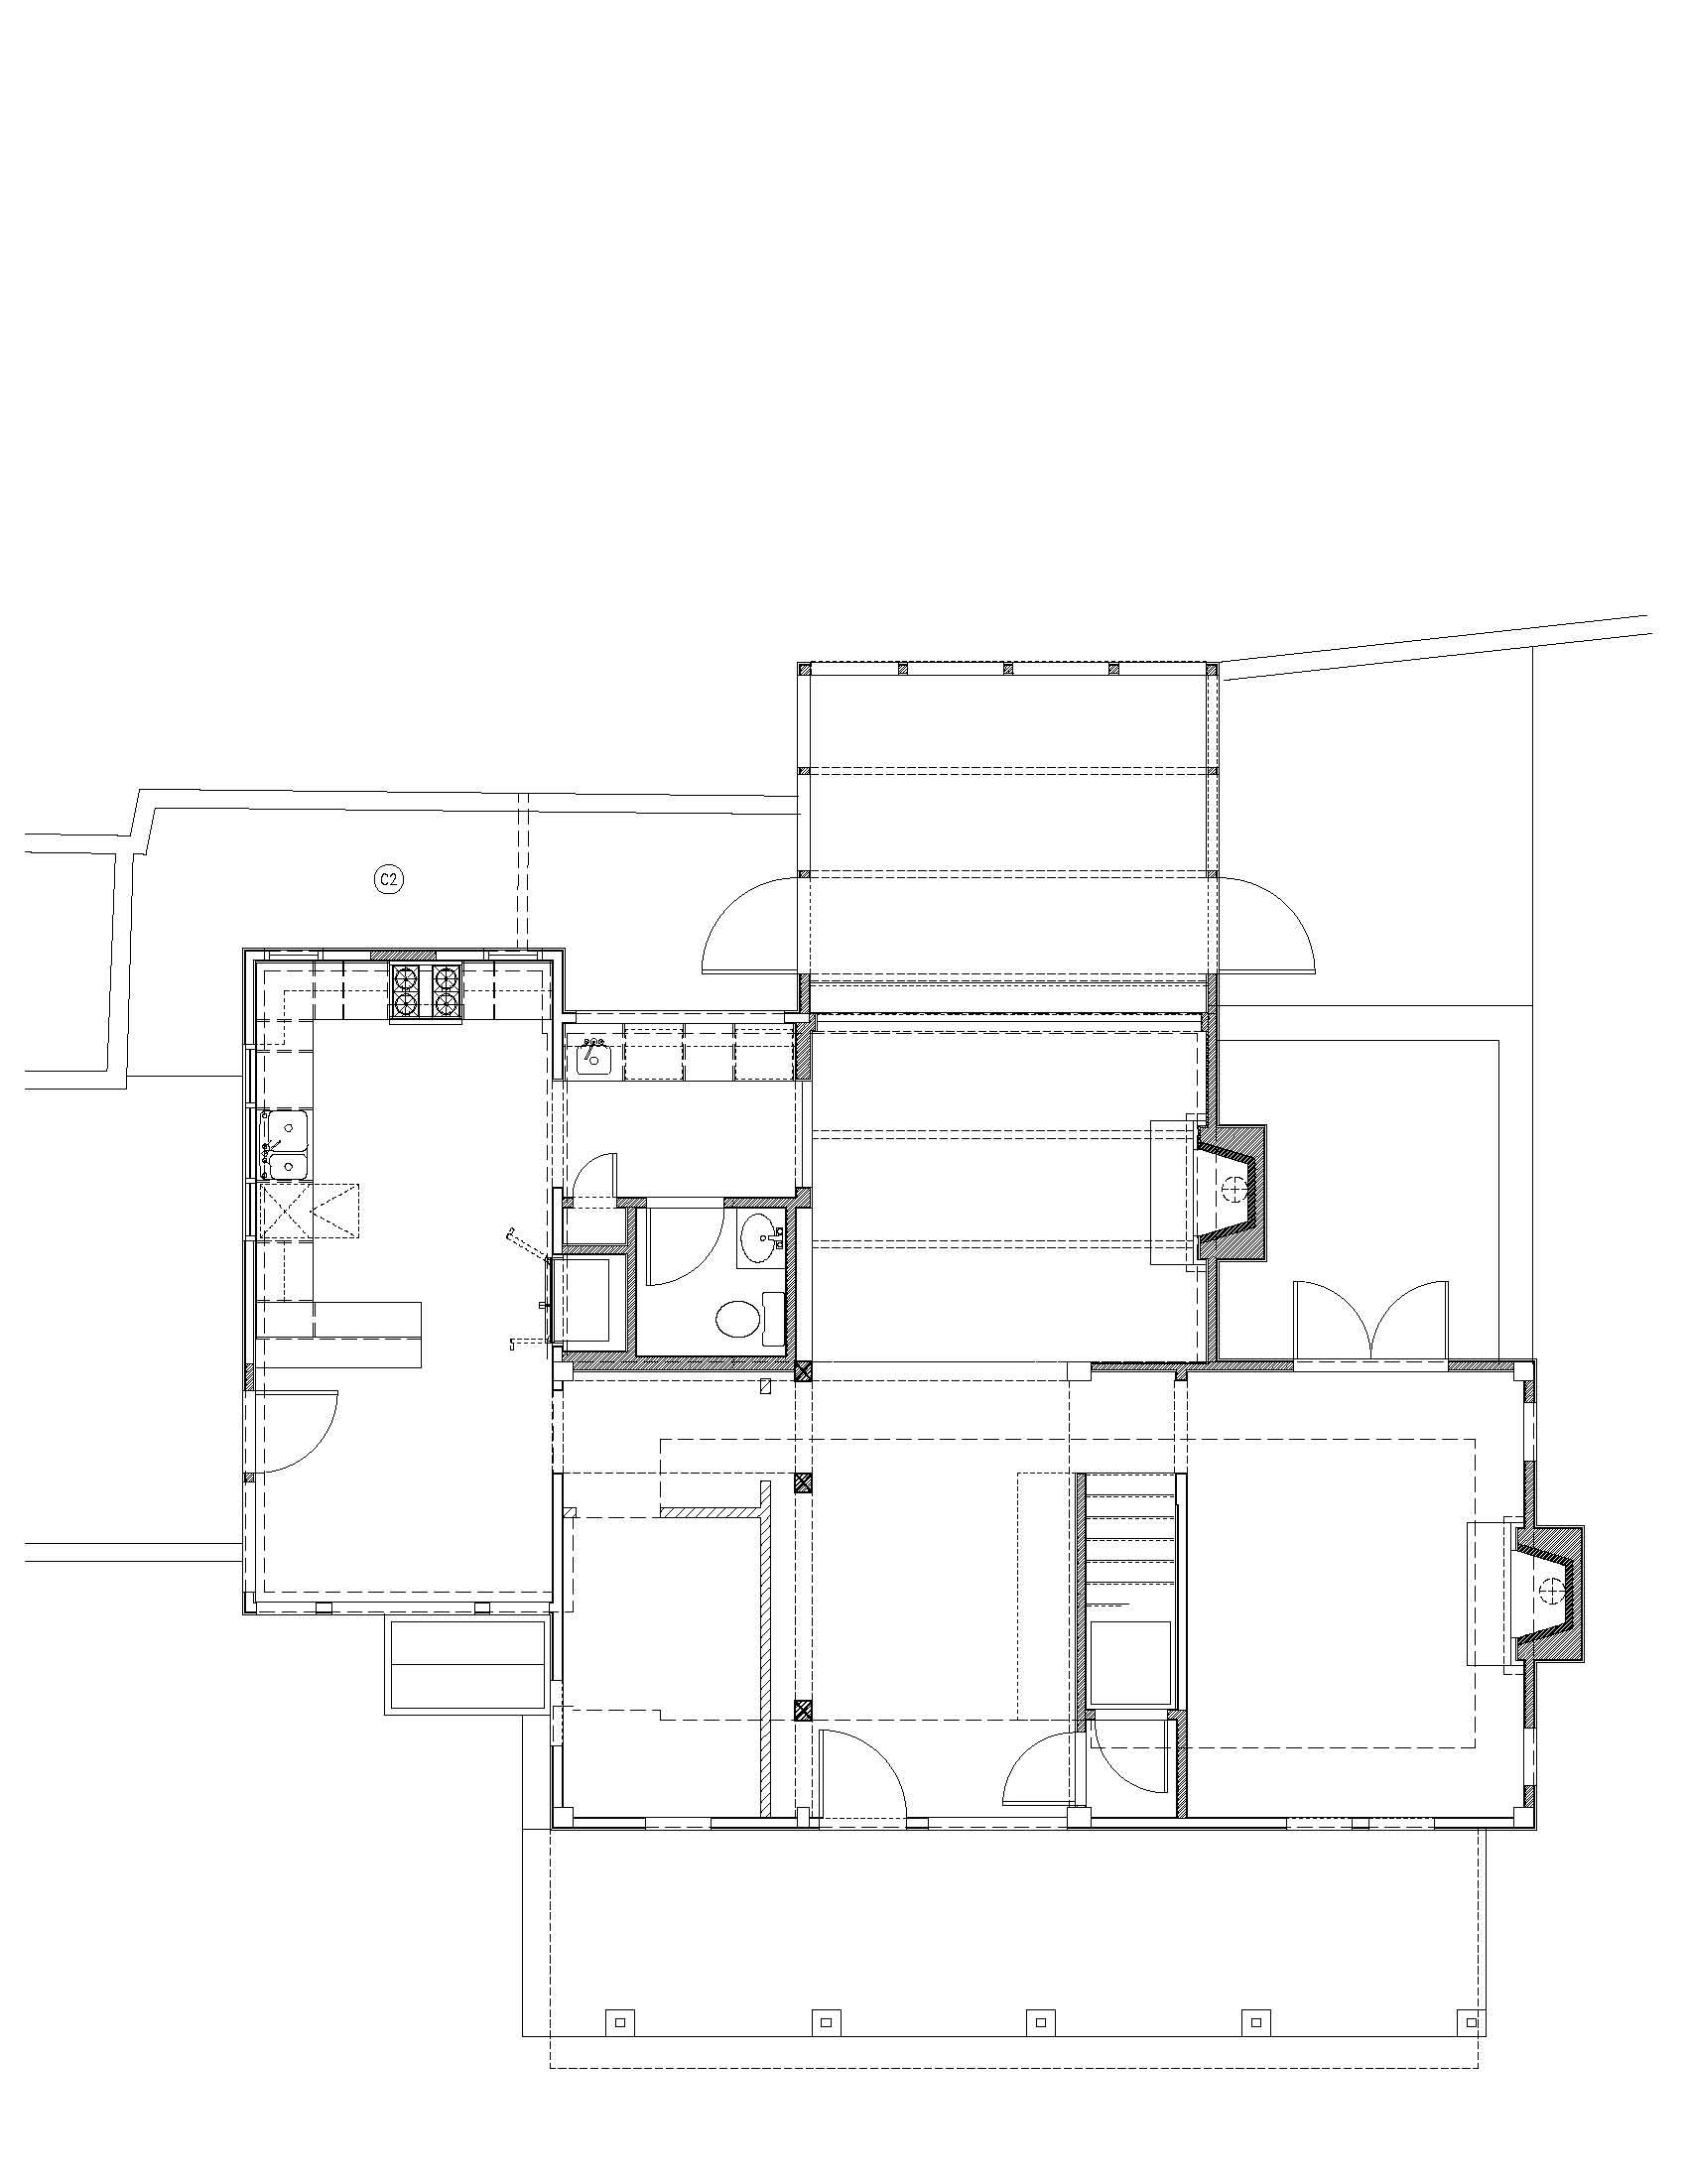 Revised First Floor Plan